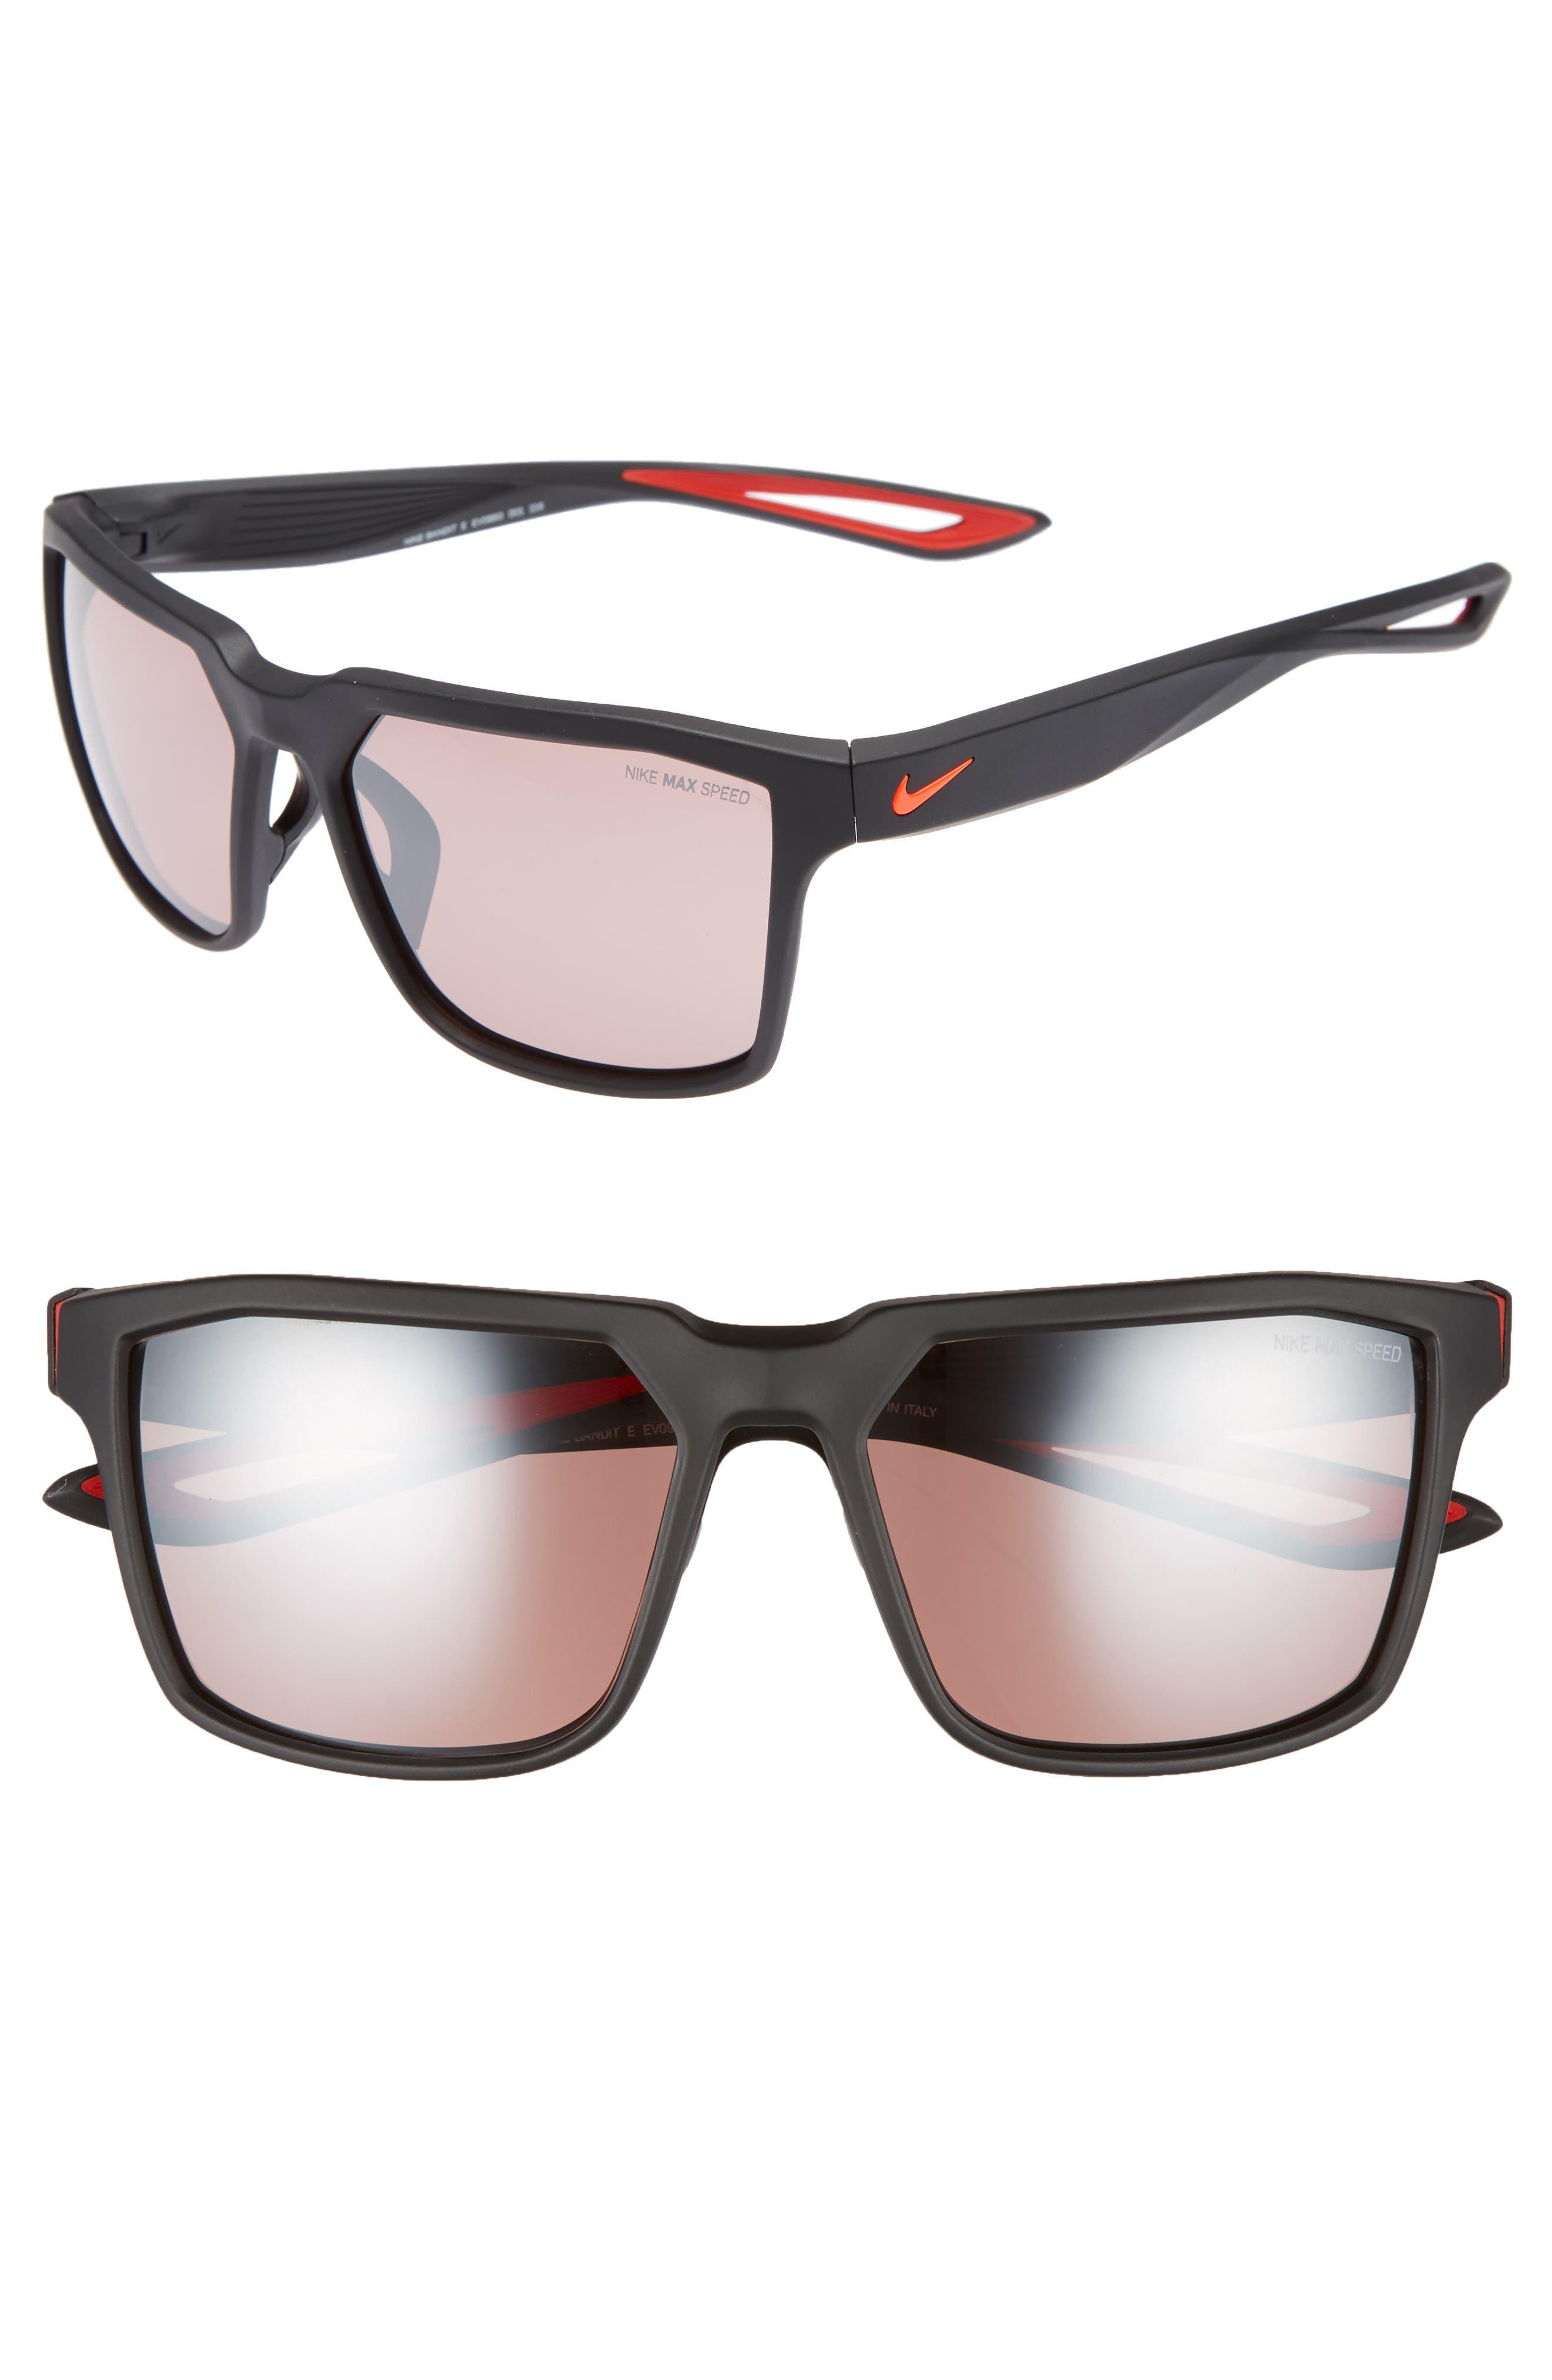 Bandit E 59mm Running Sunglasses,                             Main thumbnail 1, color,                             001